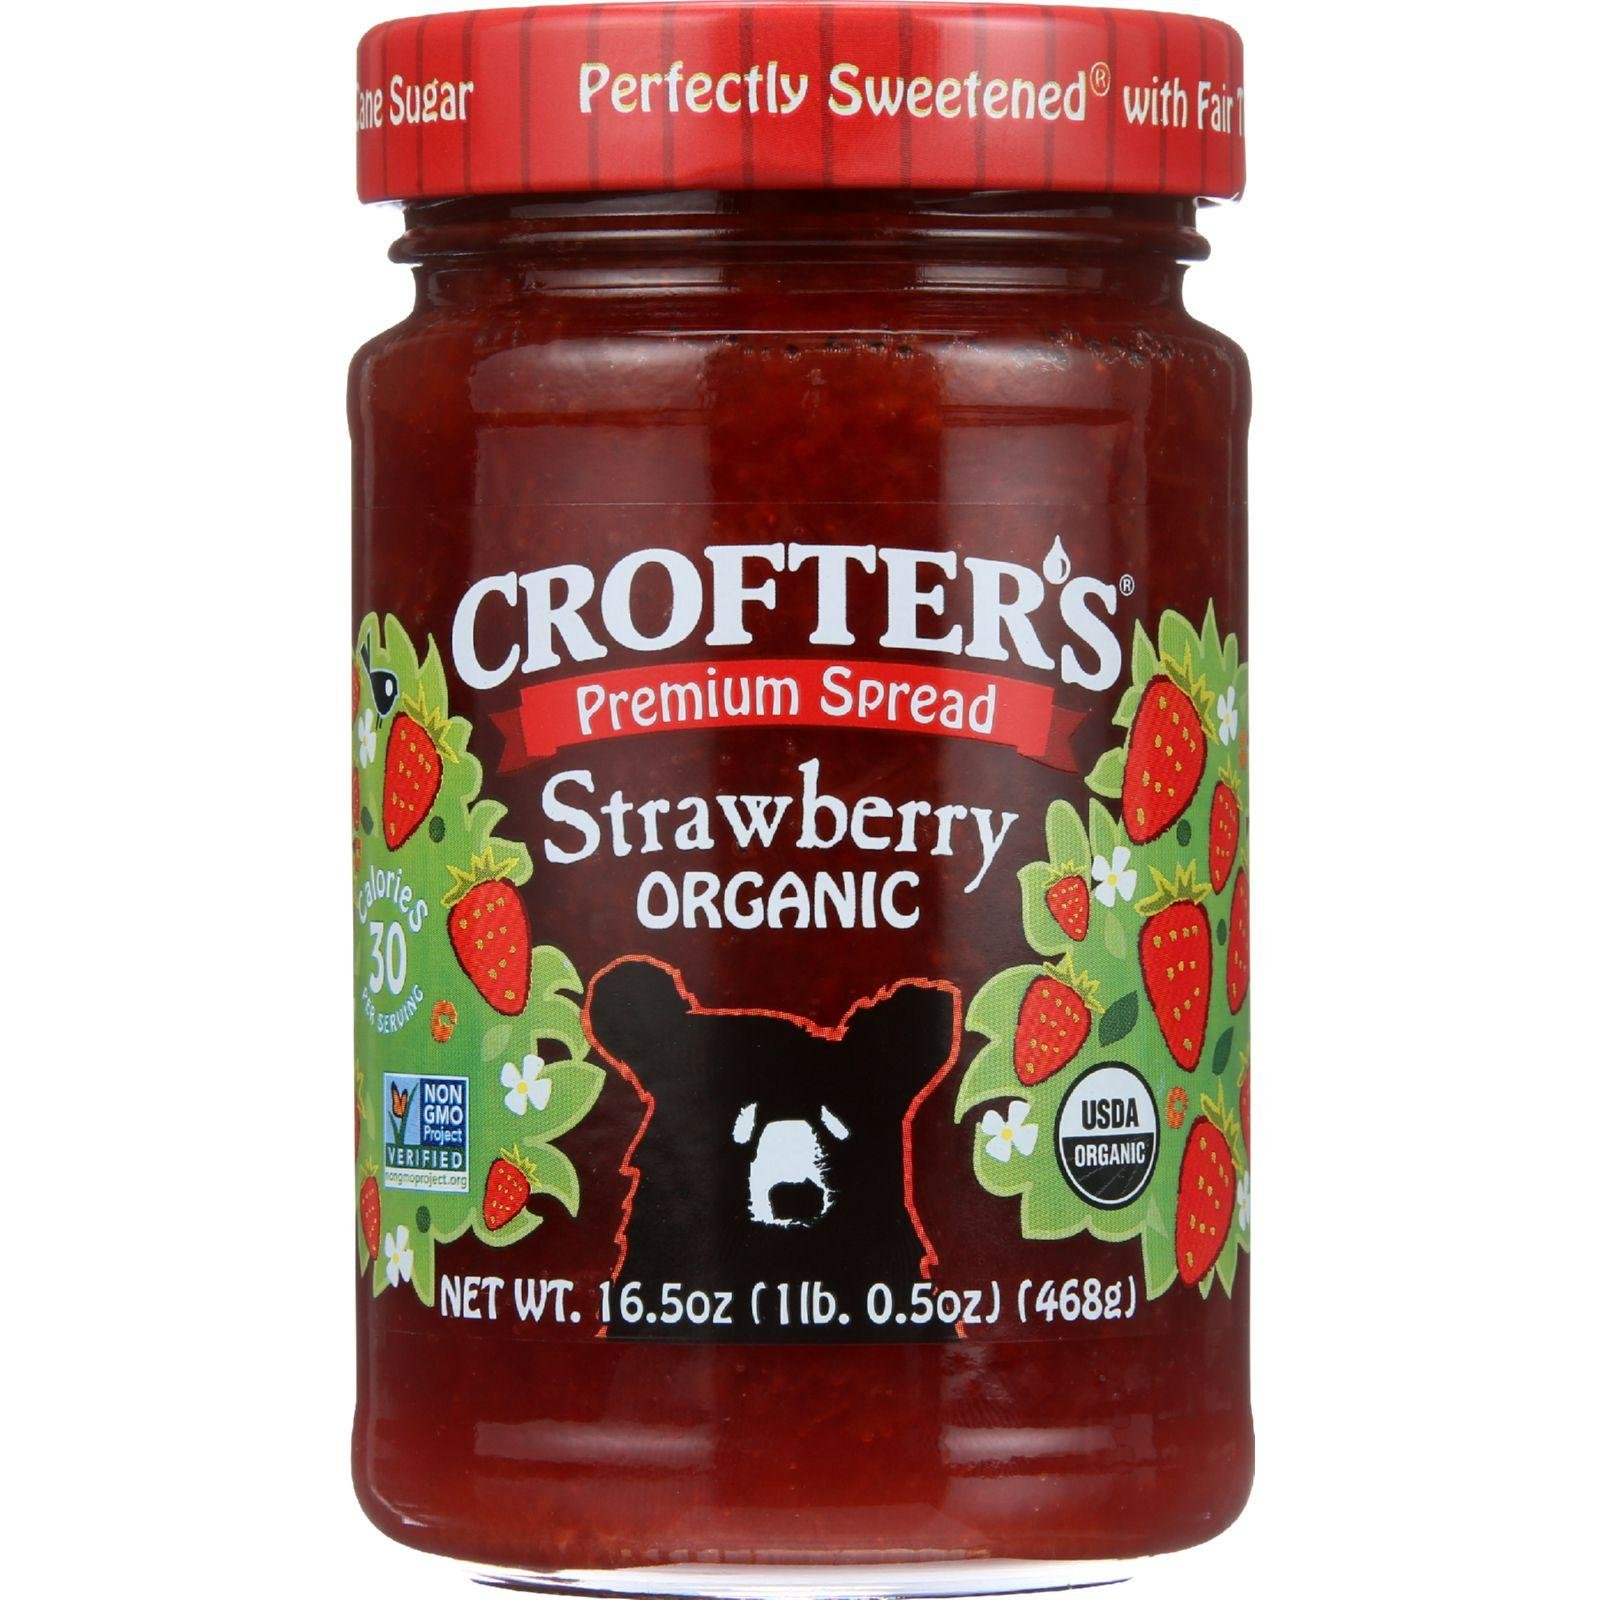 Crofters Fruit Spread - Organic - Premium - Strawberry - 16.5 oz - Pack of 6